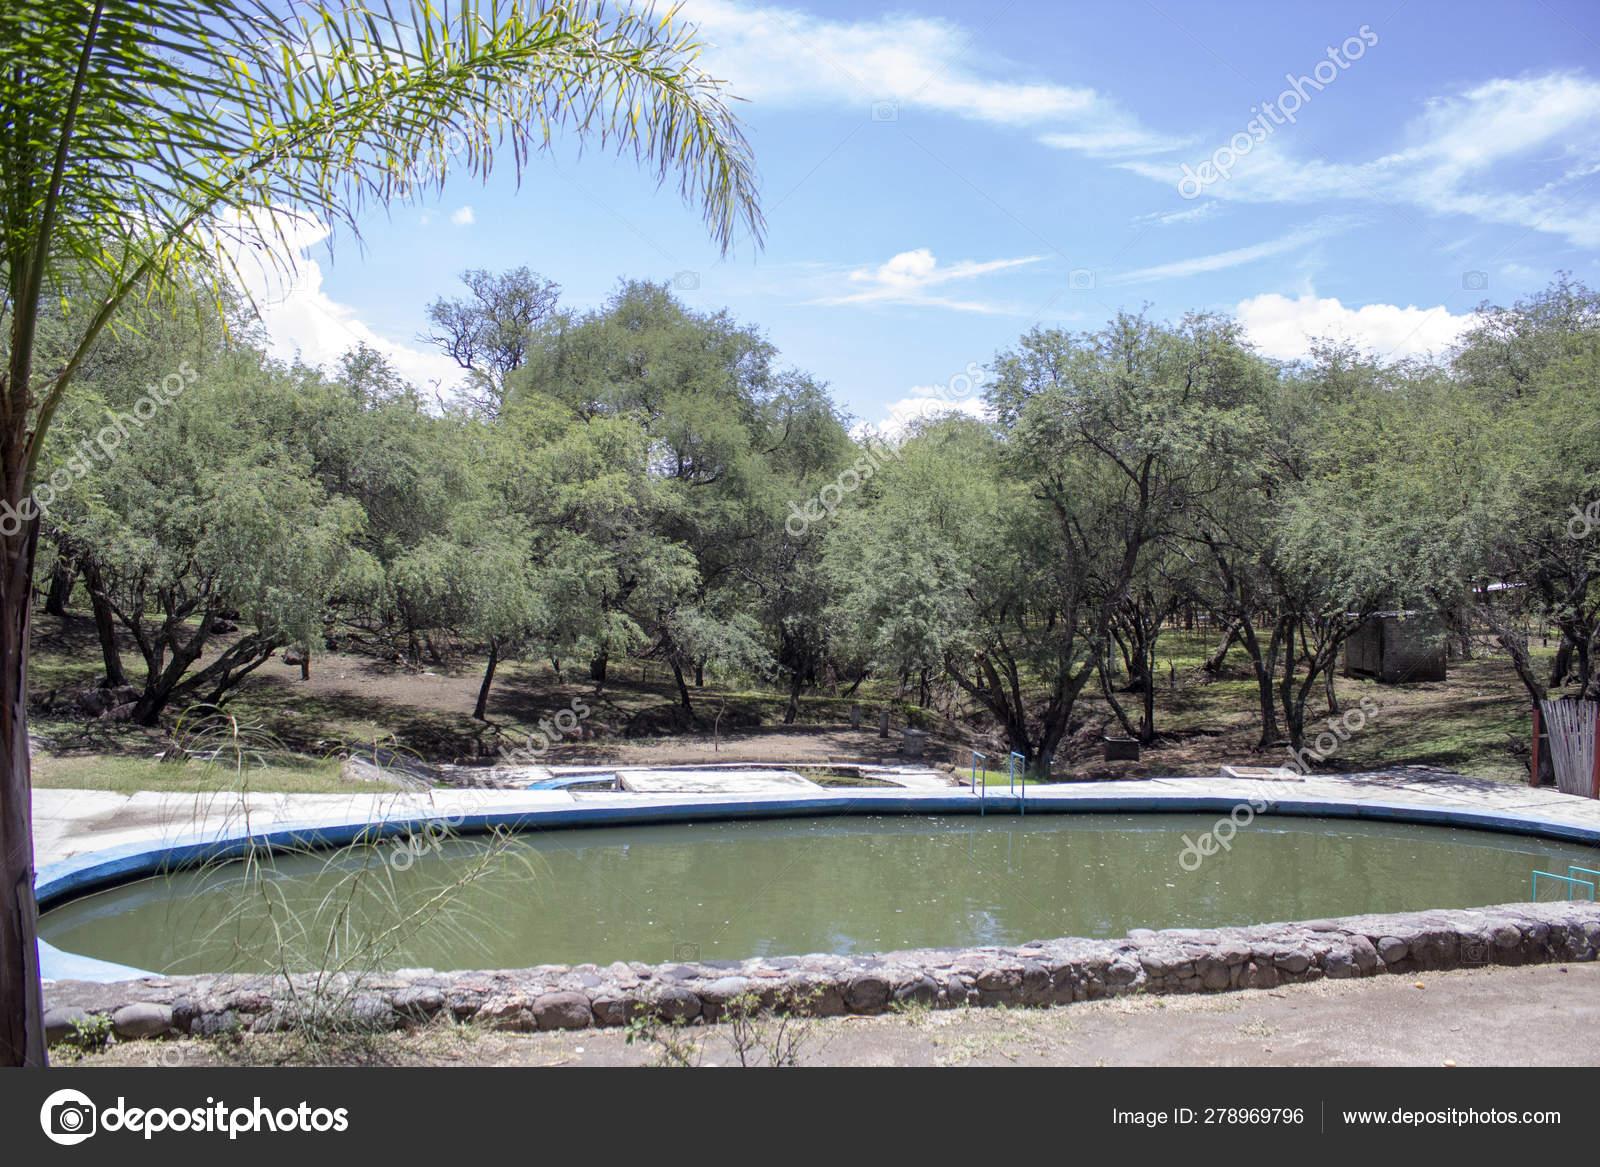 Dirty green water pool — Stock Photo © nailotl@hotmail com #278969796